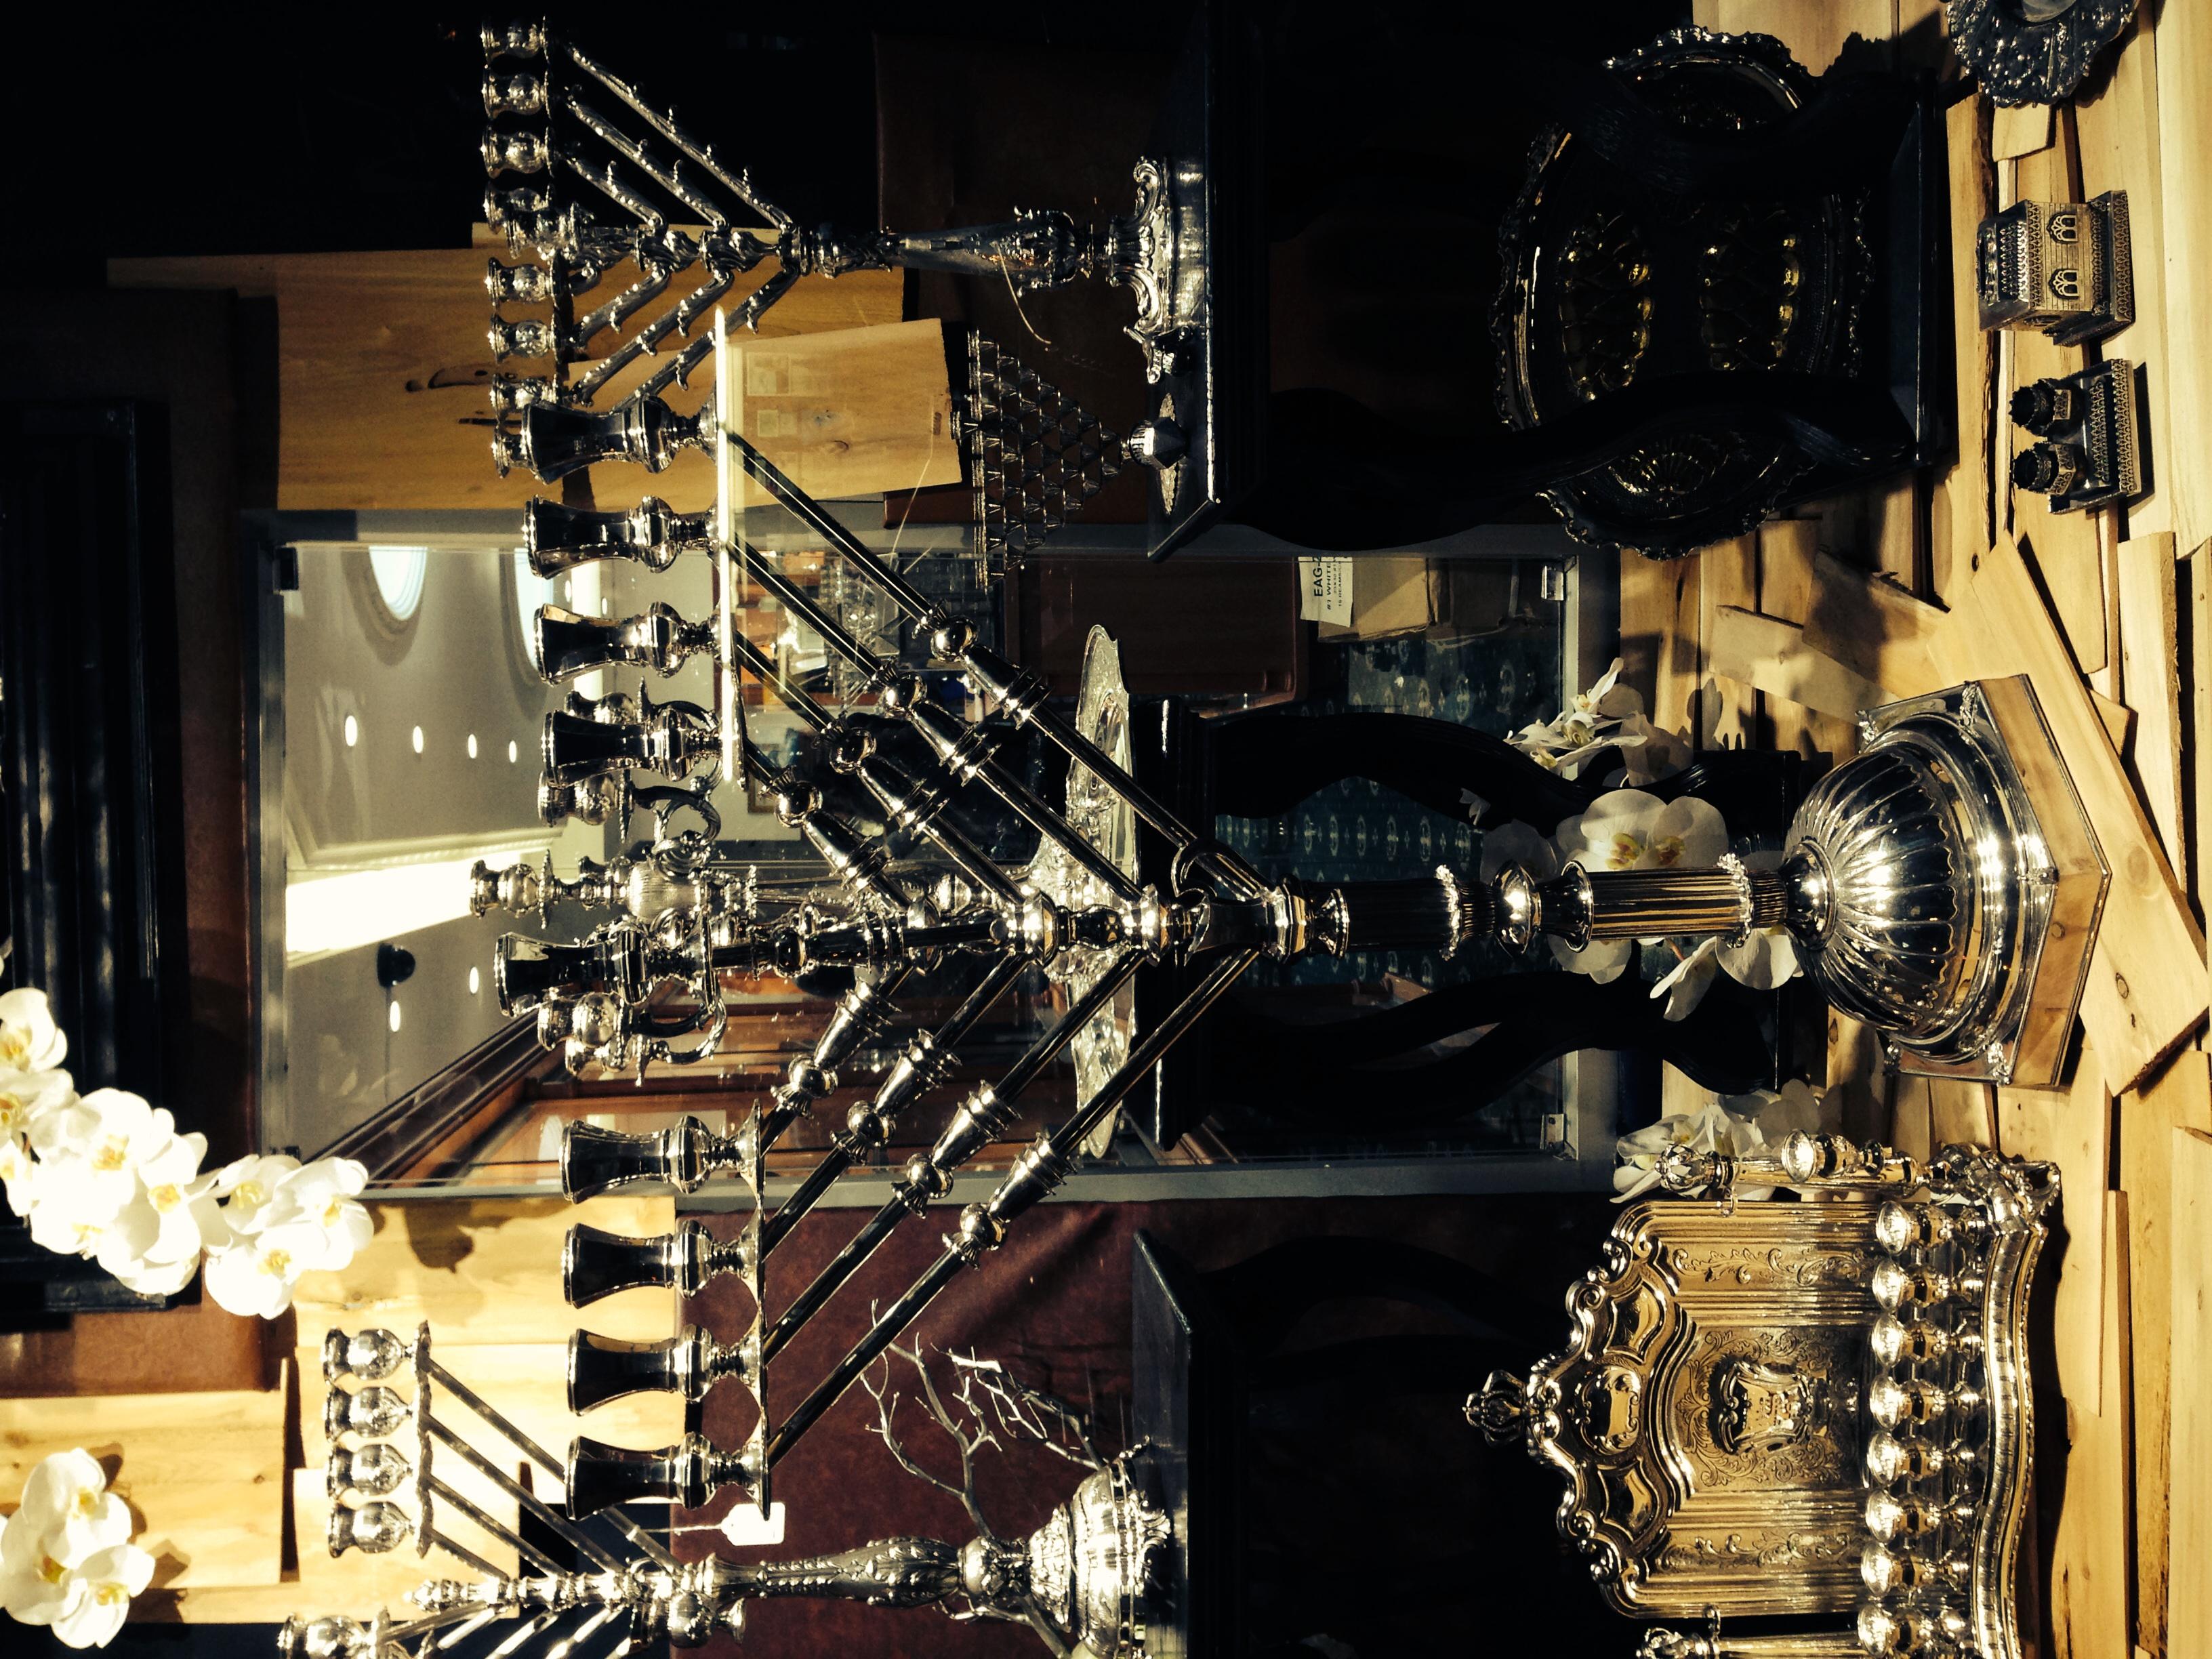 Elite Sterling Silver Stores beautiful Menorah display!